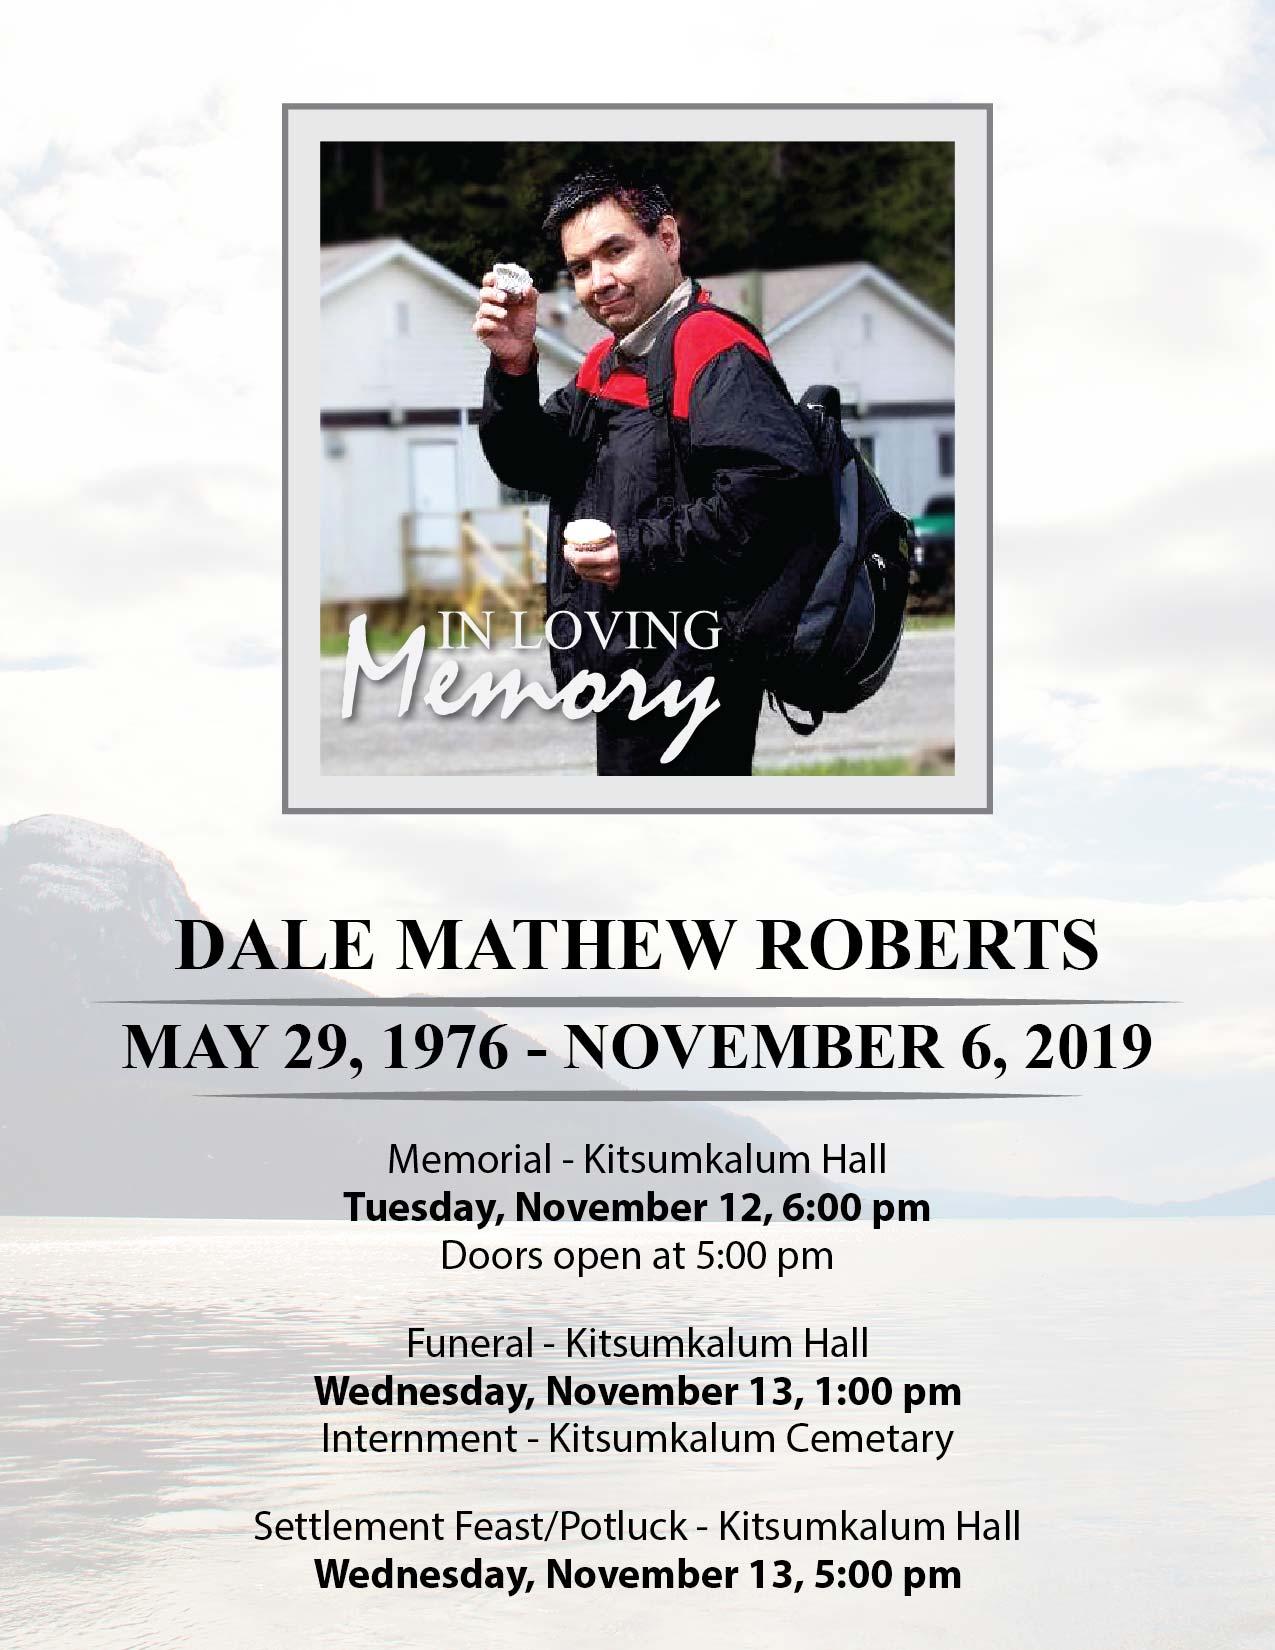 Arrangements for Dale Mathew Roberts November 2019